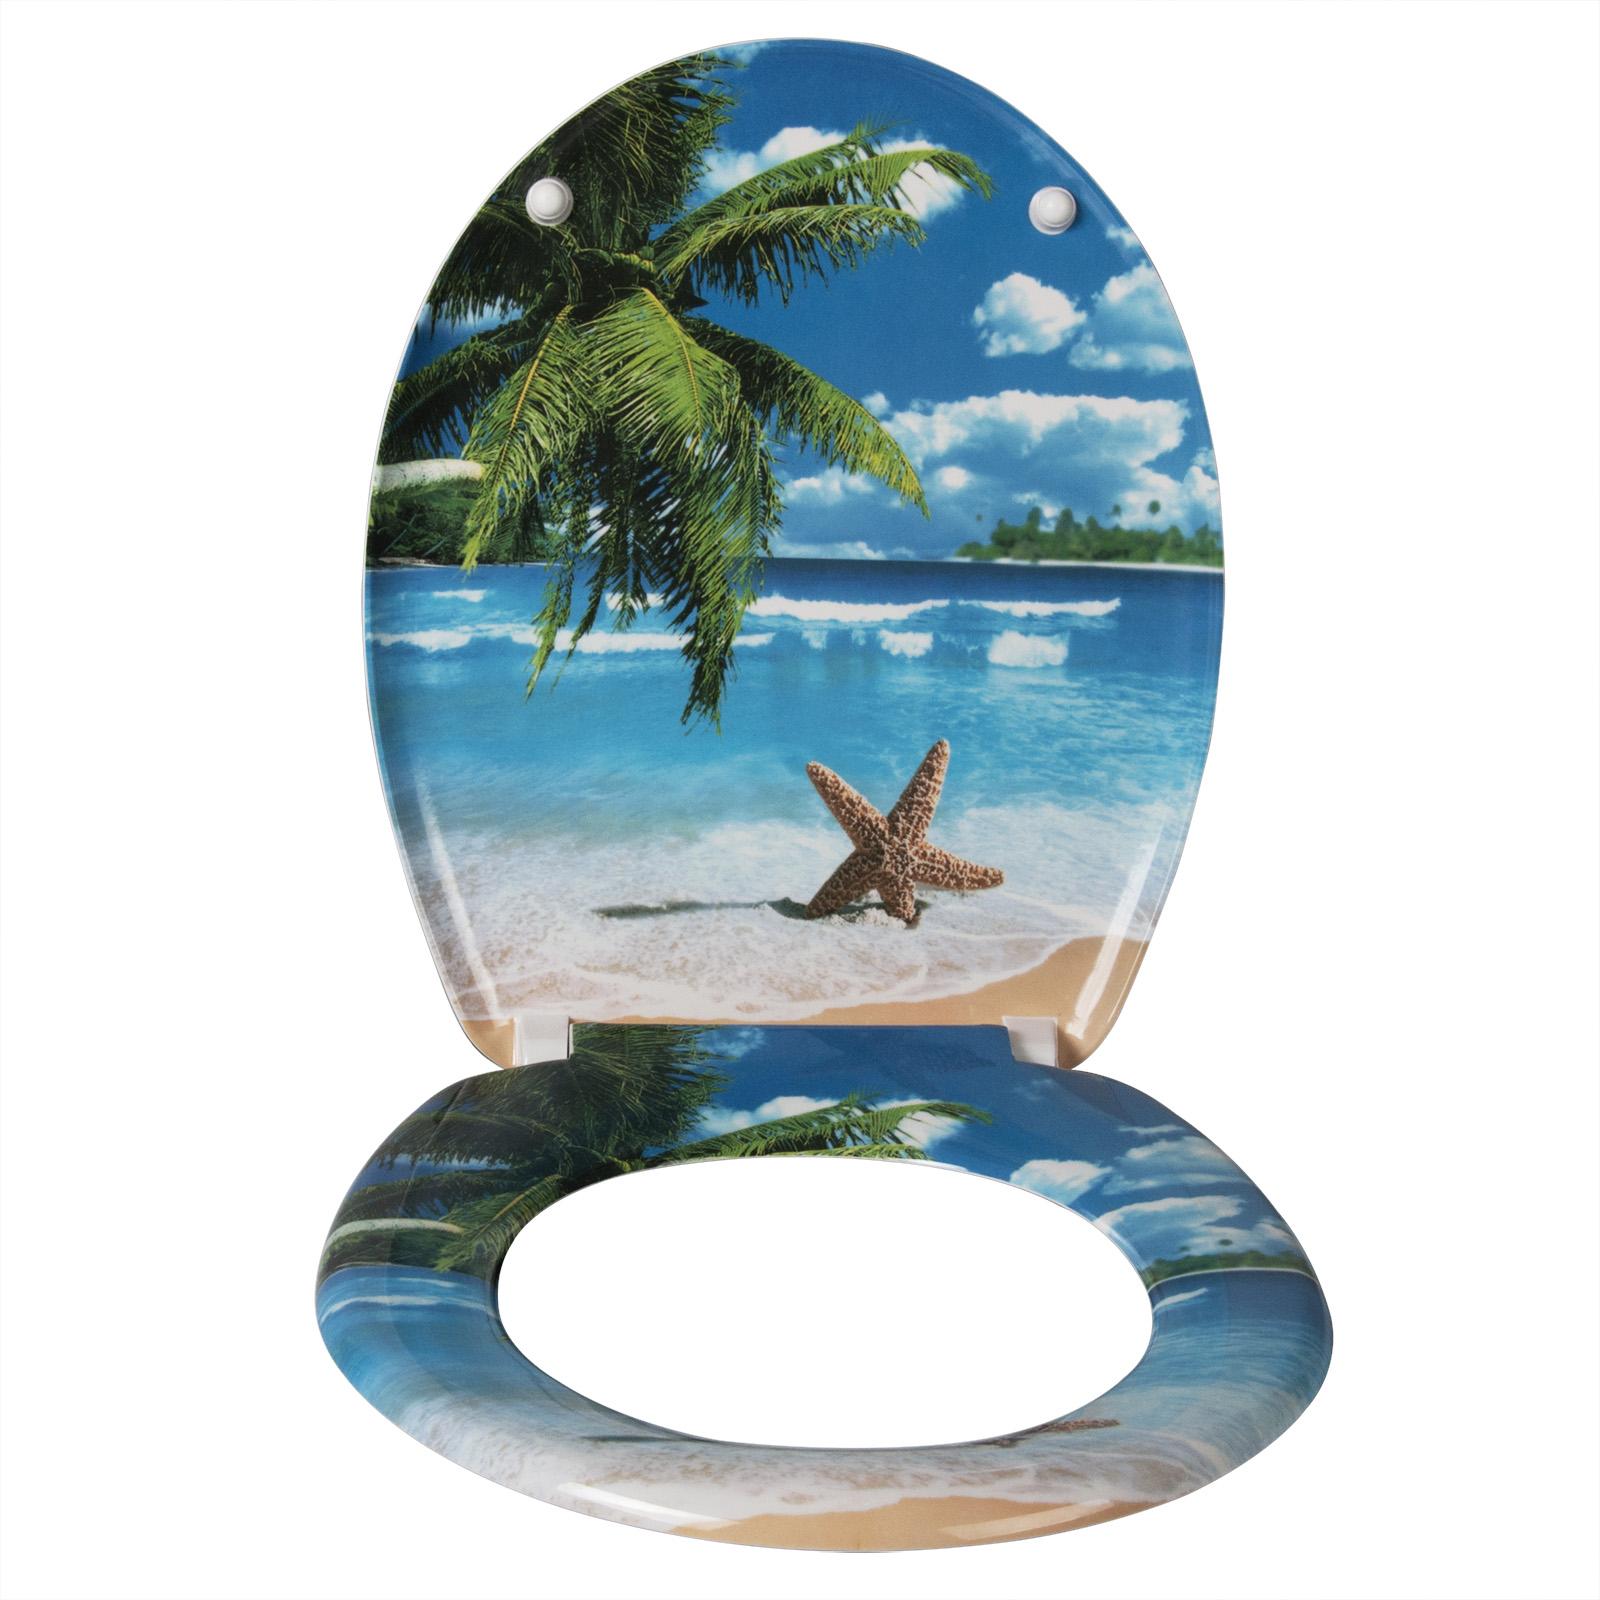 Toilettensitz Toilettendeckel Absenkautomatik Klobrille Duroplast Bad 0420MTG